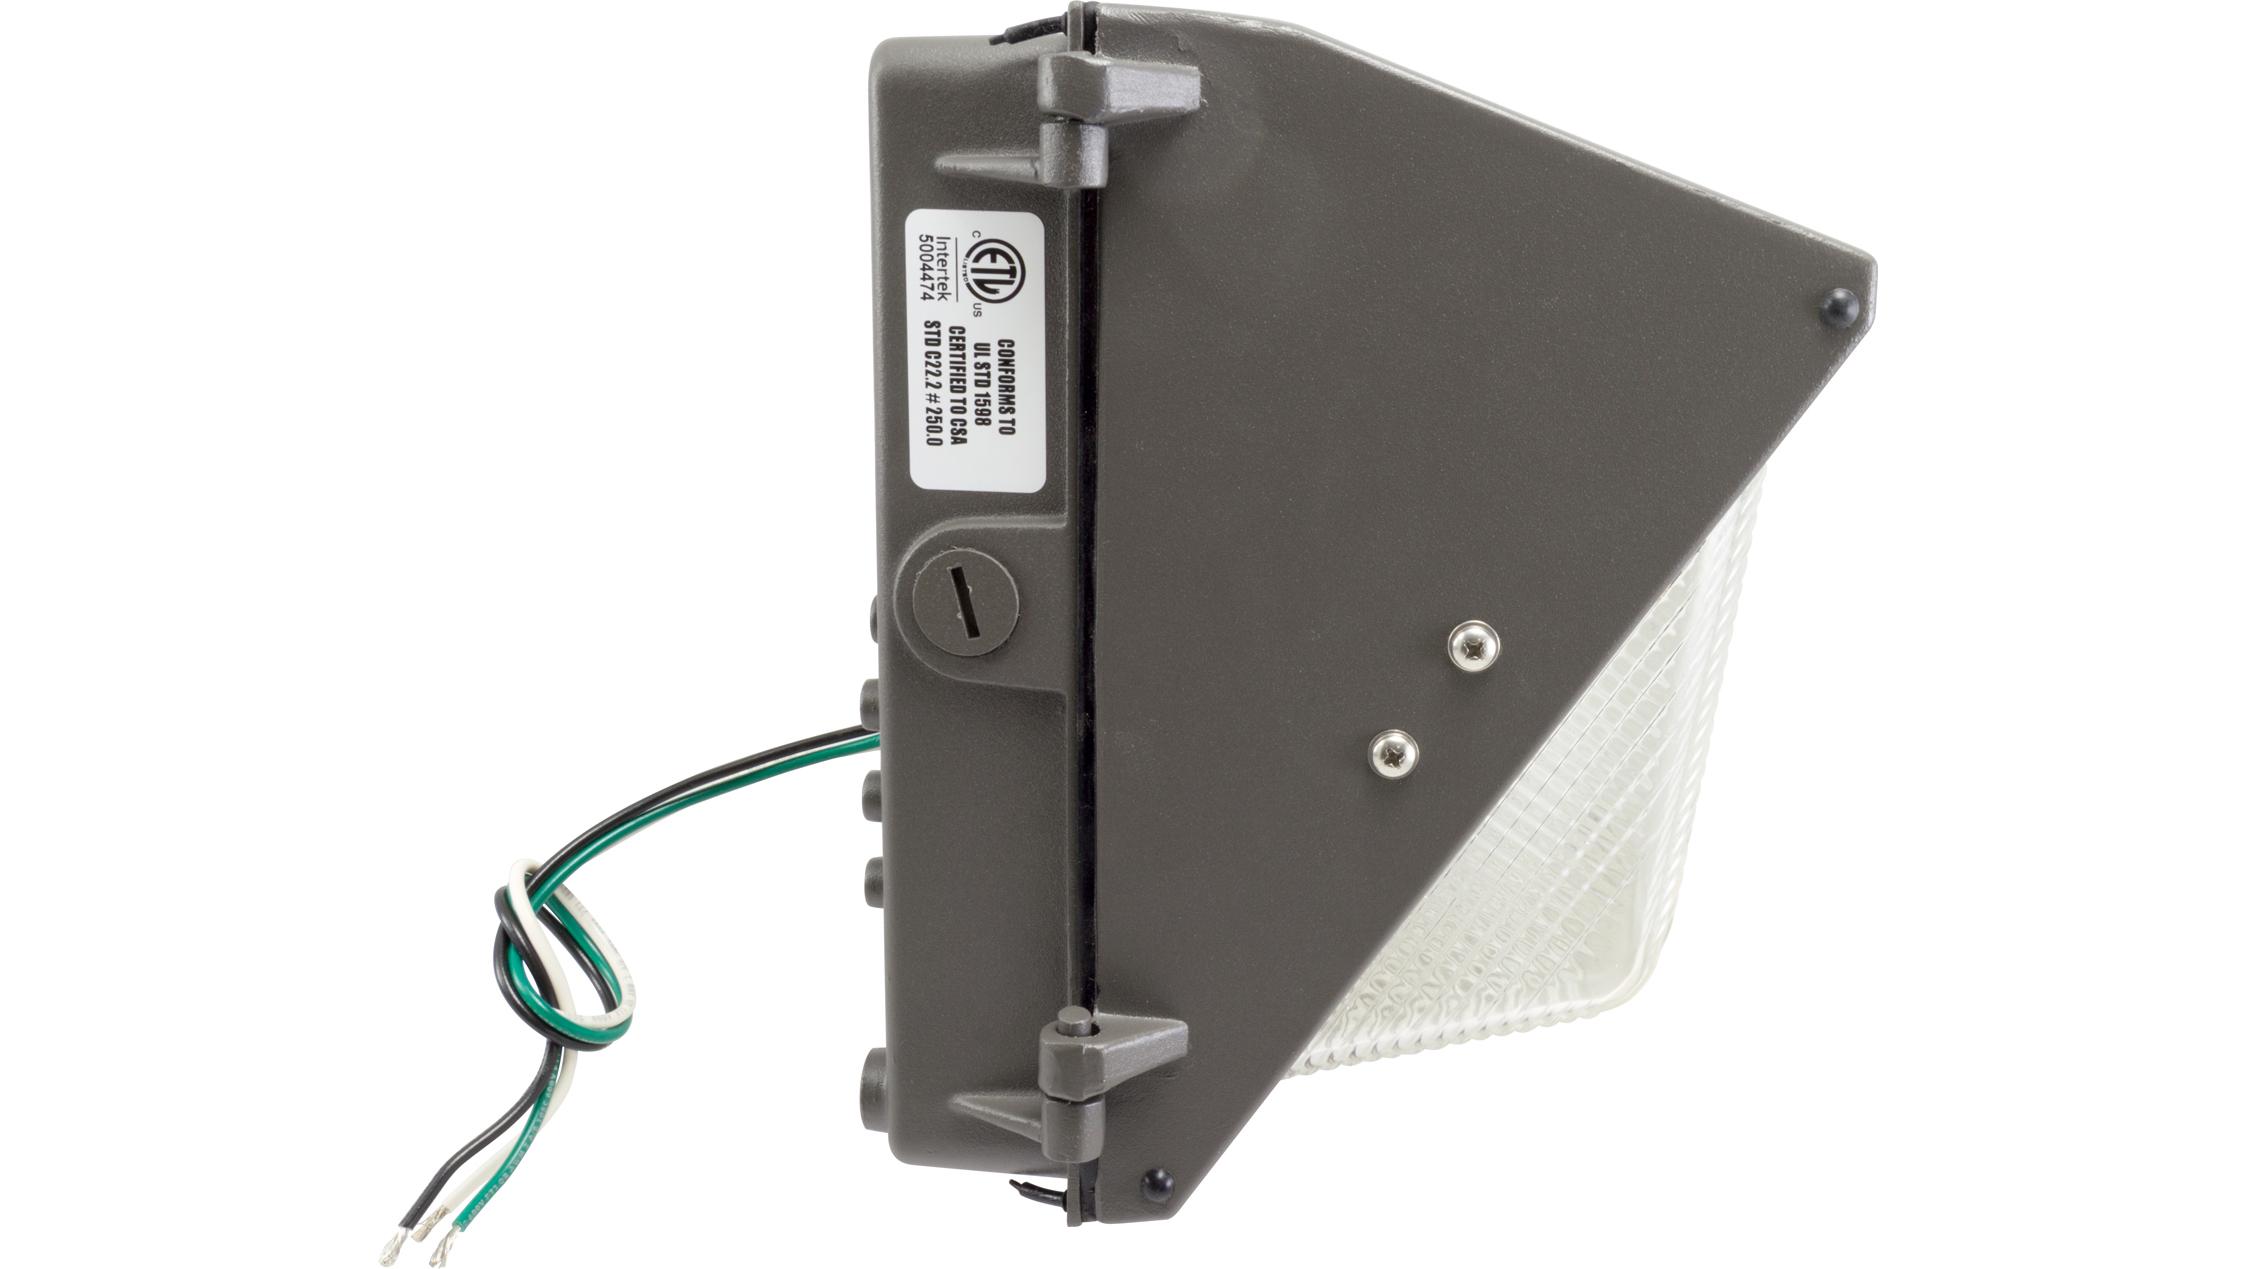 14-2cob-led-wall-pack-forward-throw-3.jpg